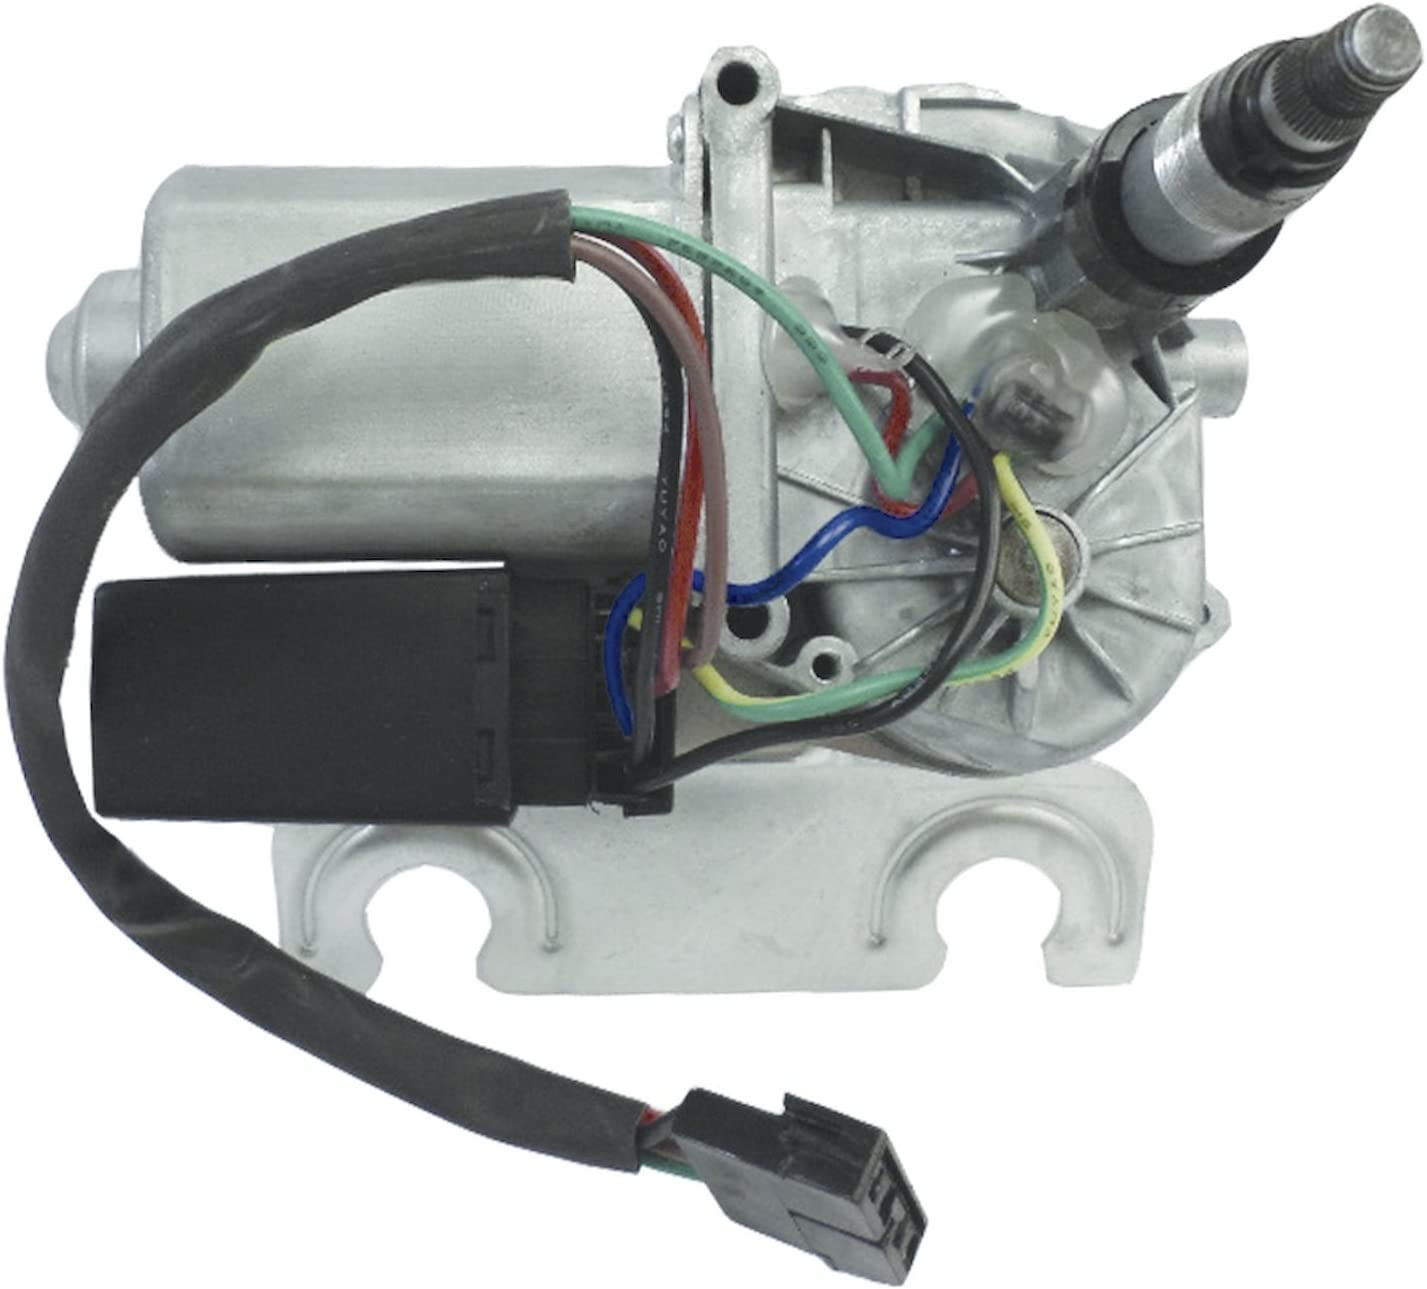 cj5 wiper motor wiring diagram jeep wiper motor wiring wiring diagrams resources  jeep wiper motor wiring wiring